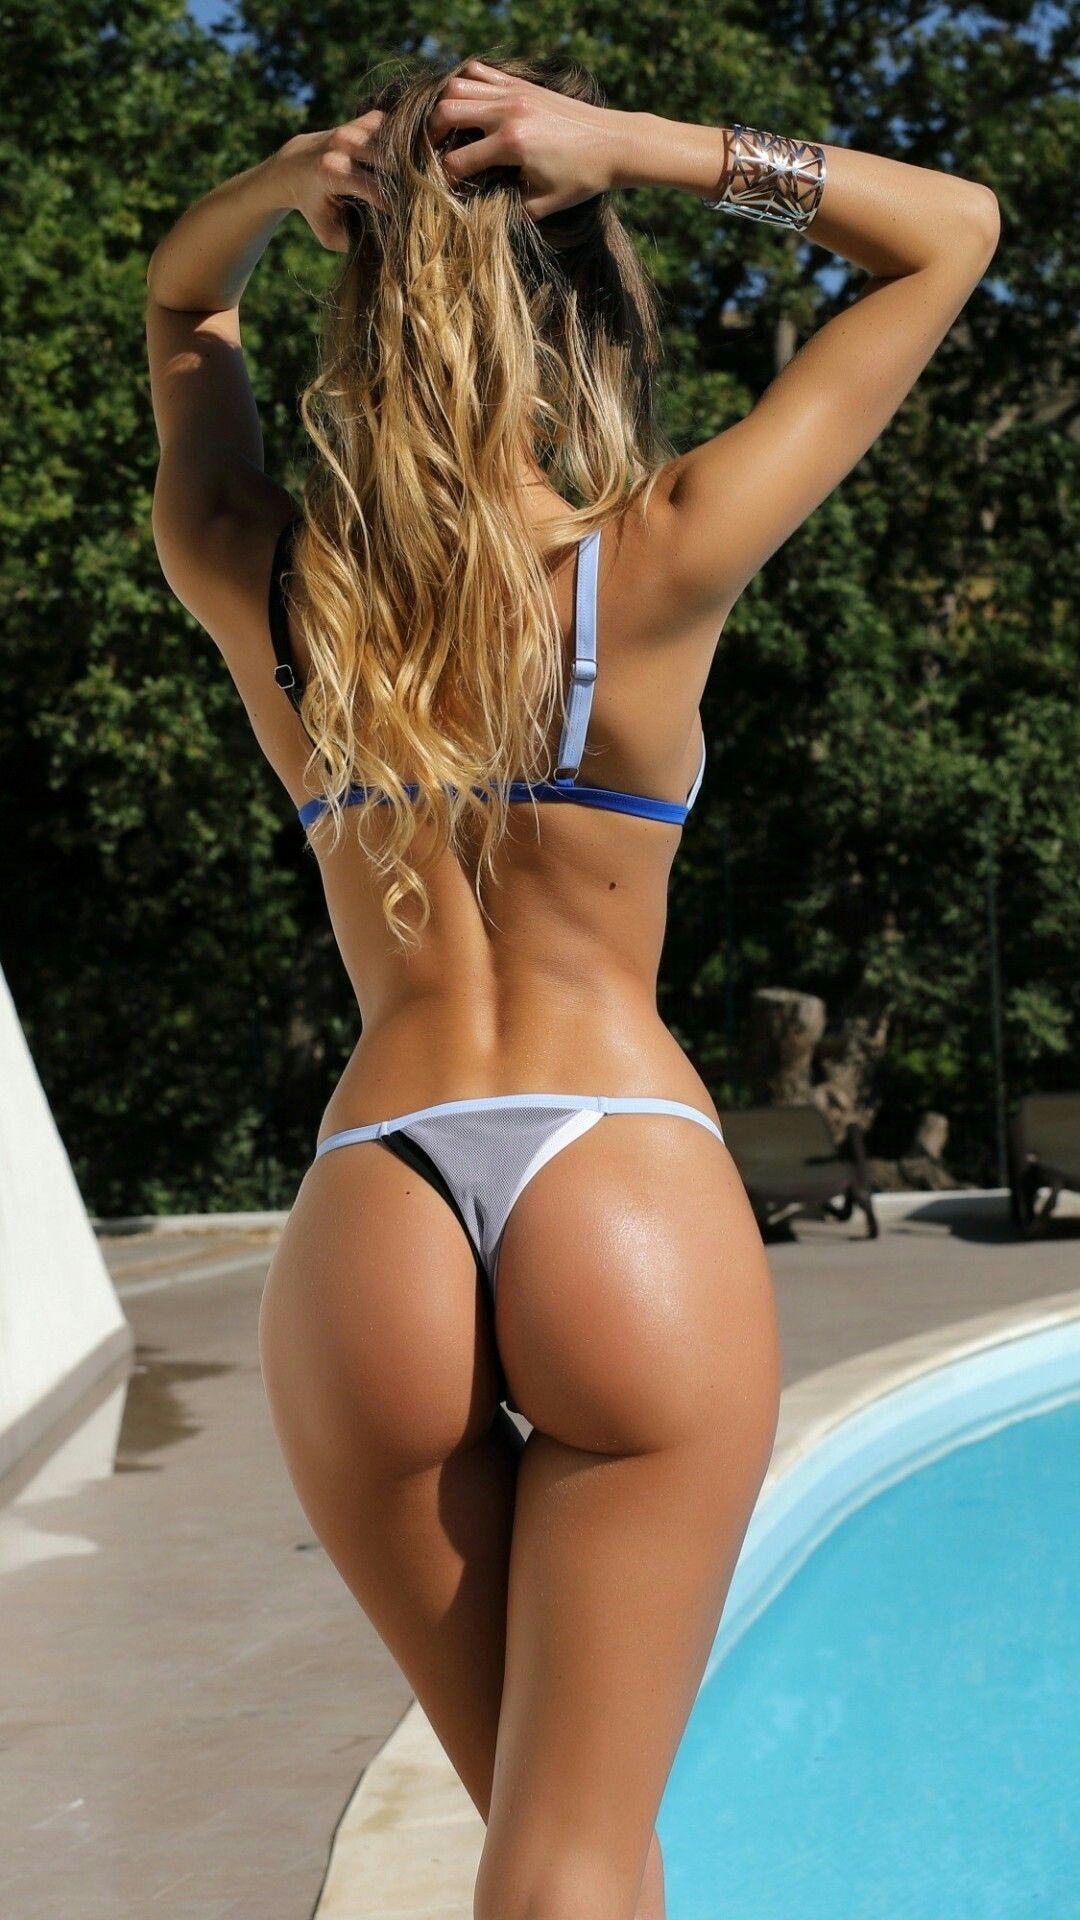 Beach bikini butt pool